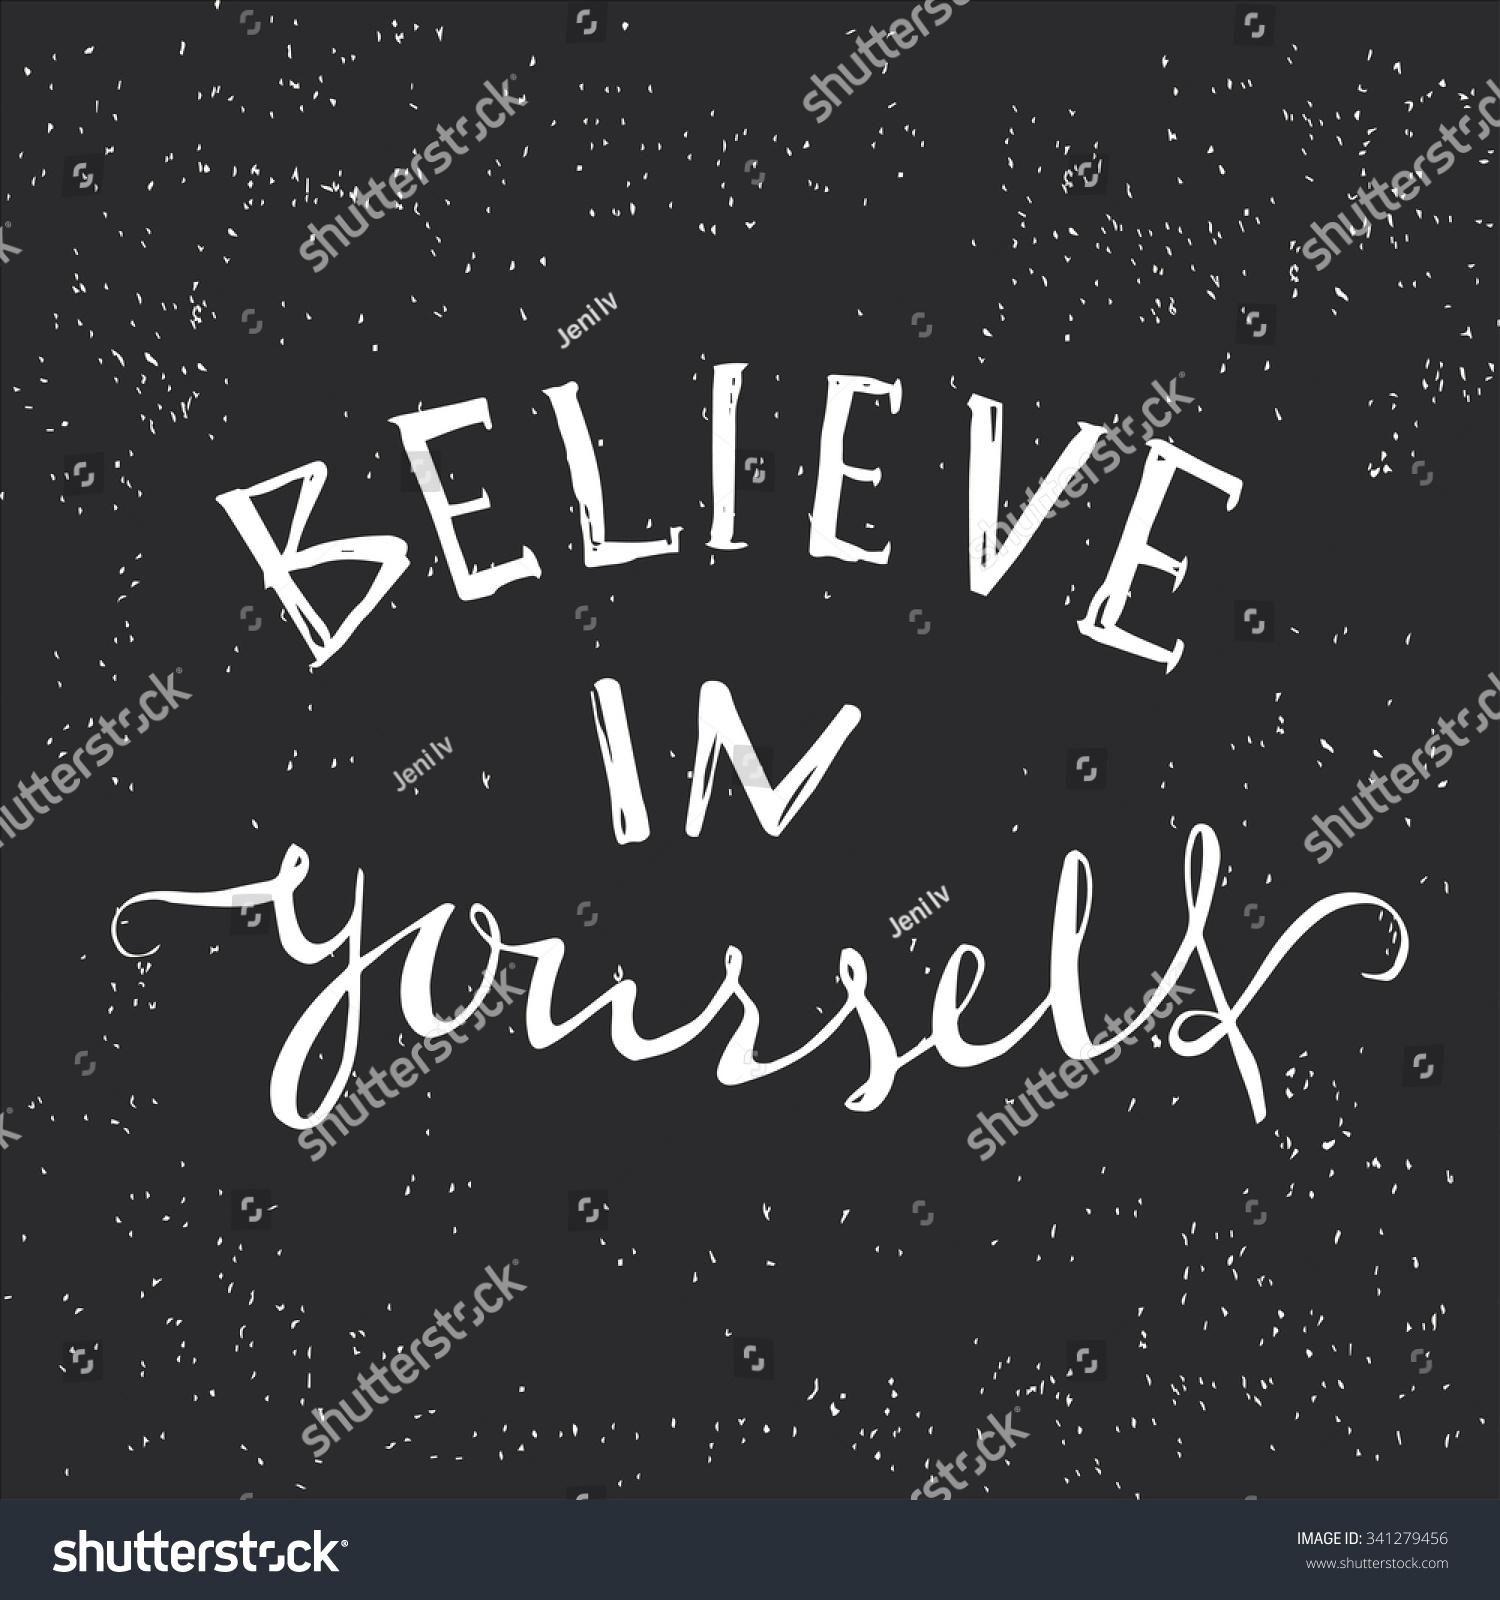 Believe yourself tshirt design handdrawn lettering stock vector believe in yourself t shirt design handdrawn lettering hand print letters biocorpaavc Choice Image